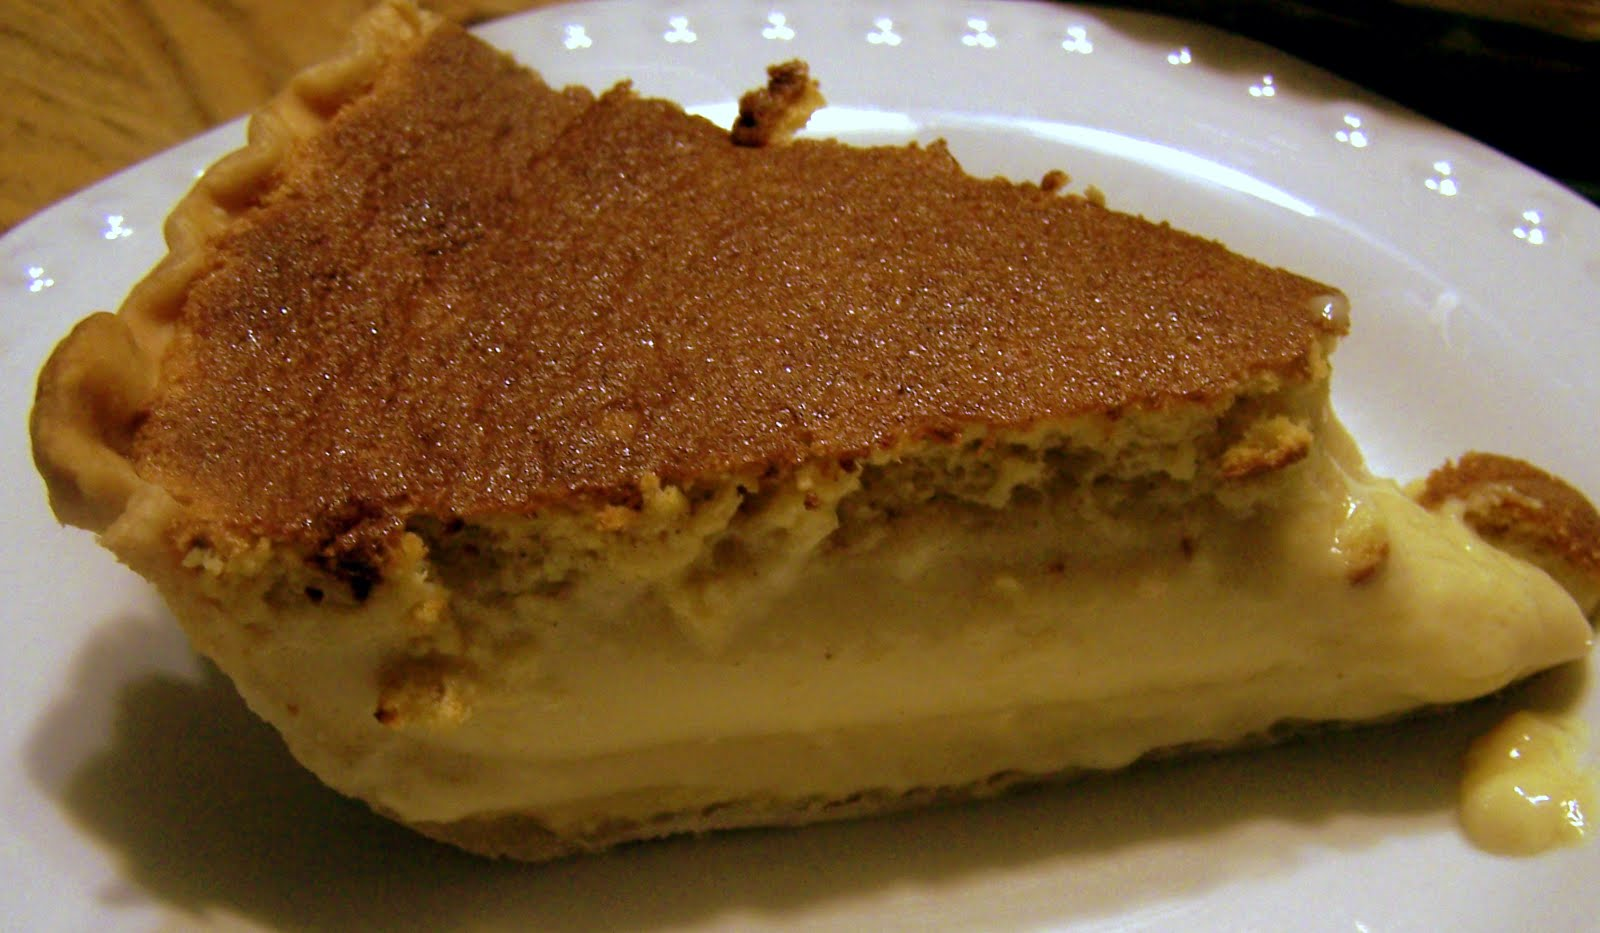 Baked Sugar Pumpkin With Brown Sugar Egg Custard Recipes — Dishmaps